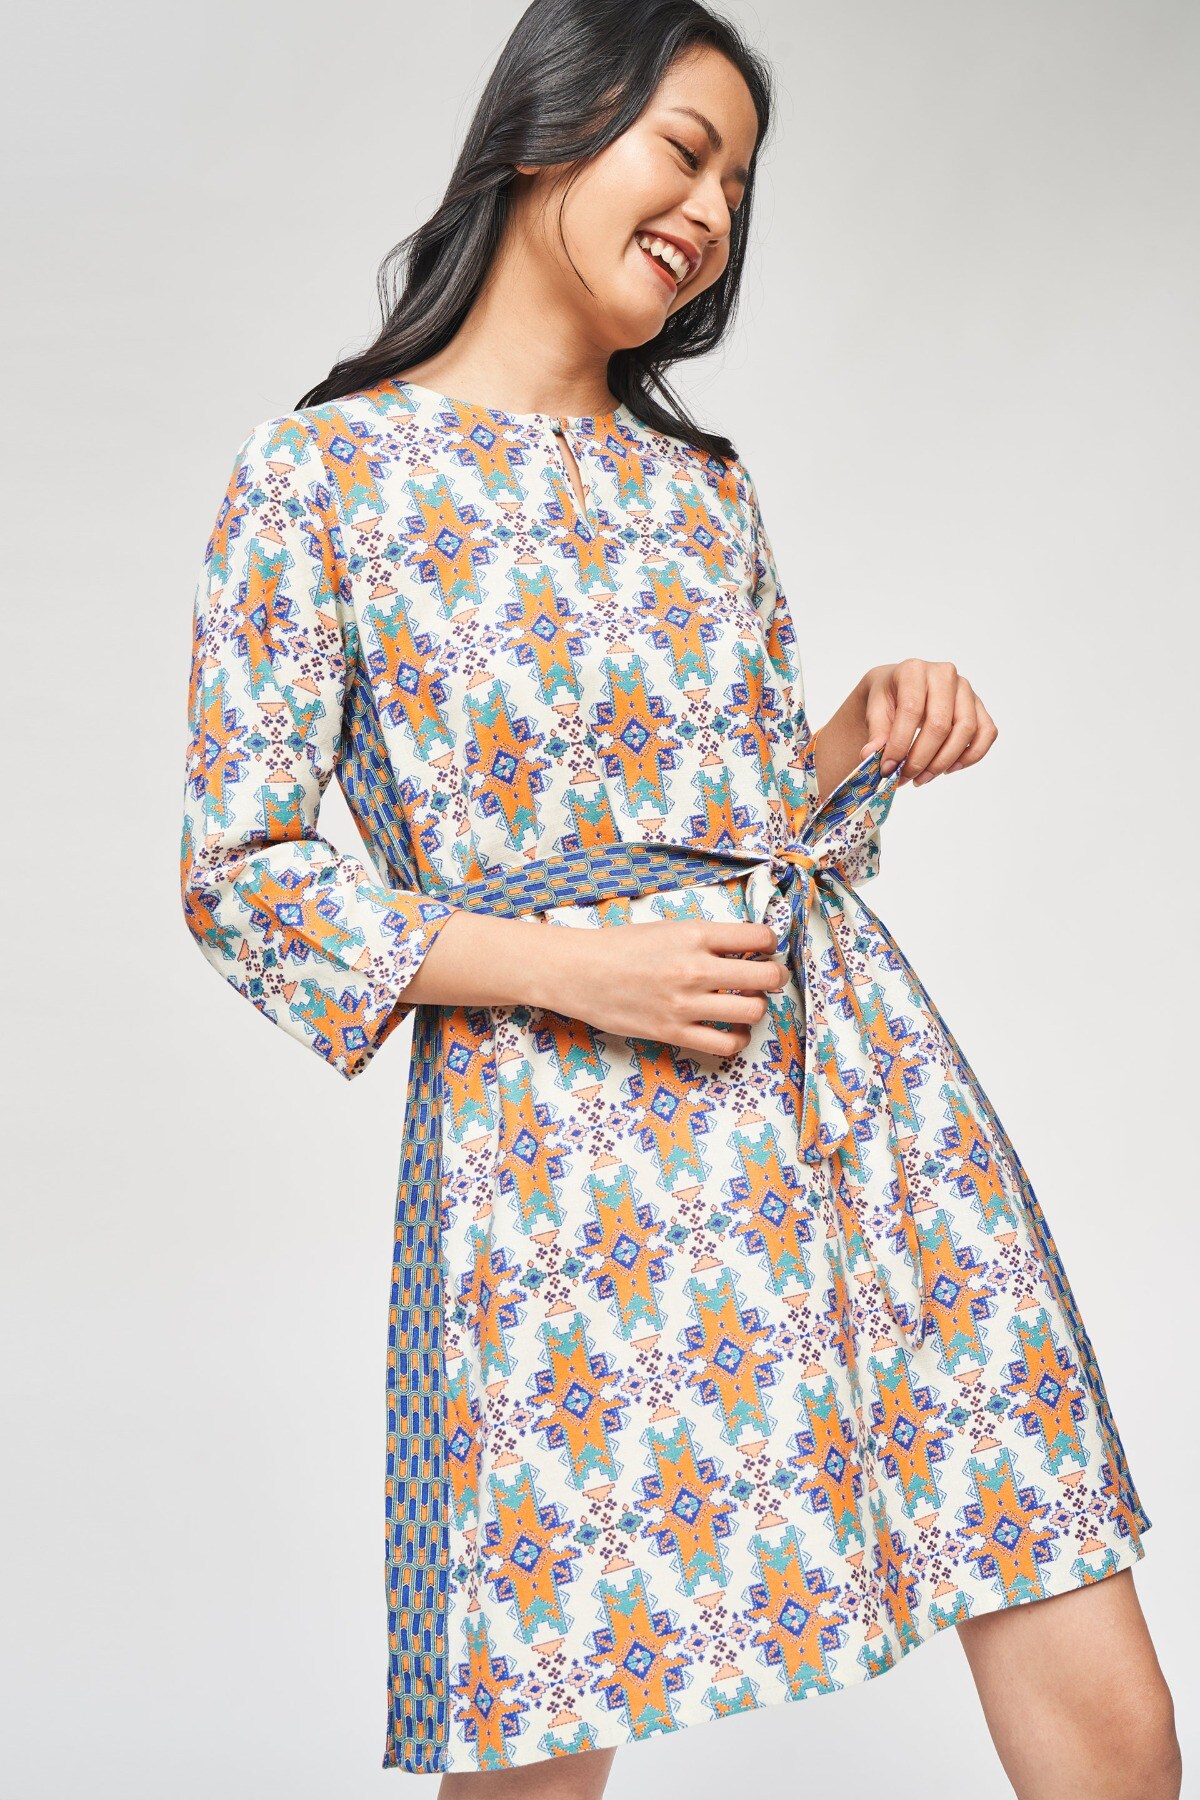 Global Desi | Off White Geometric Printed A-Line Dress